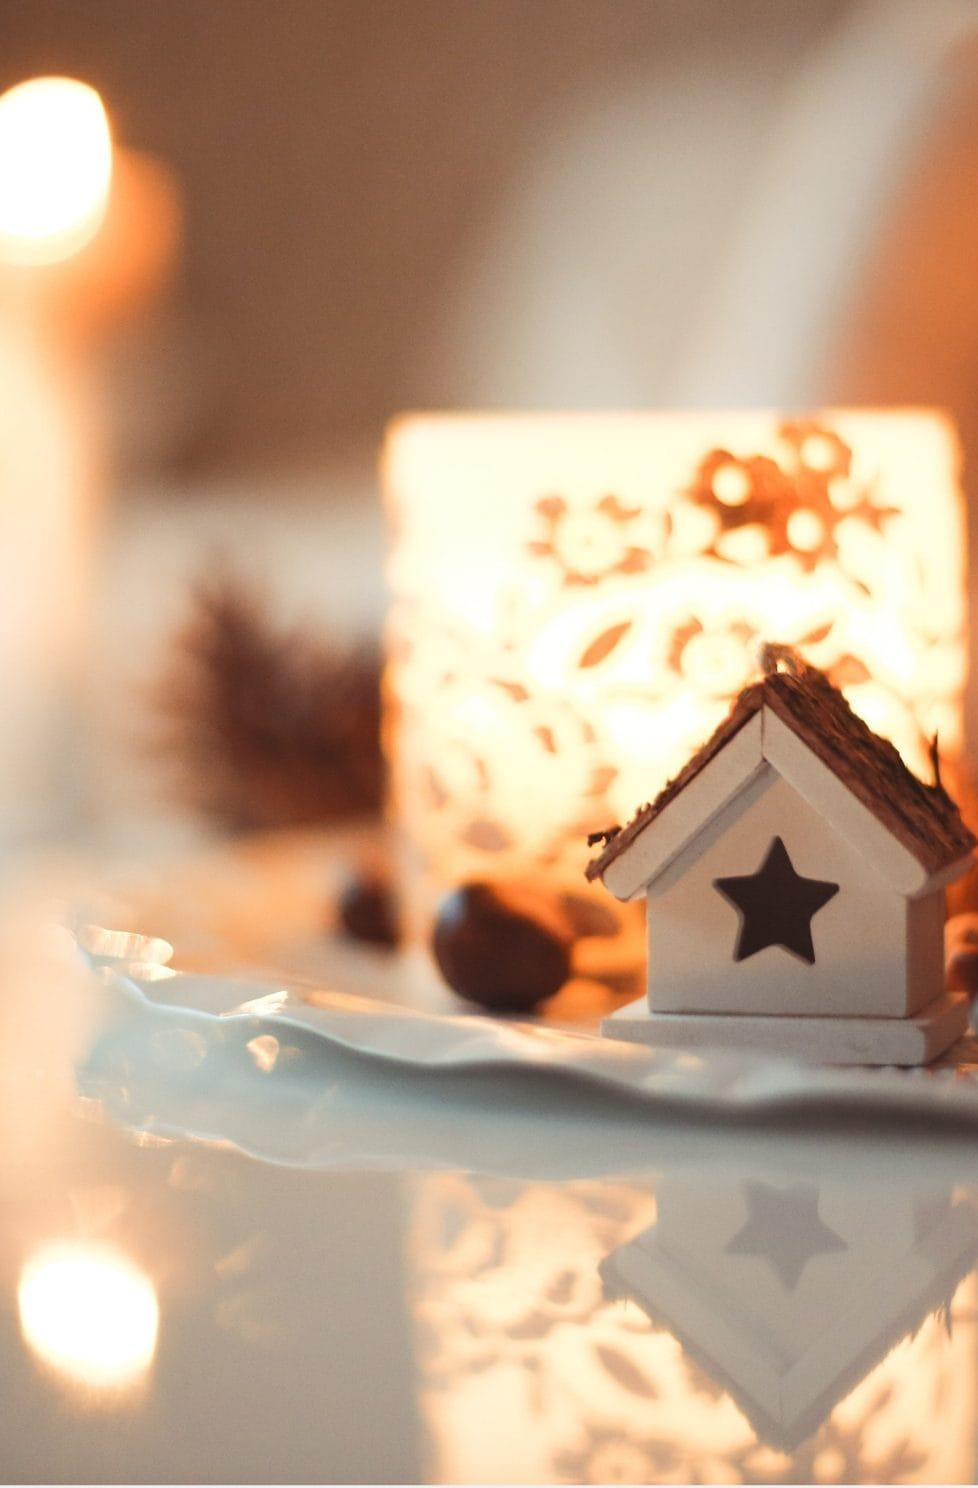 How To Make Christmas Cozy